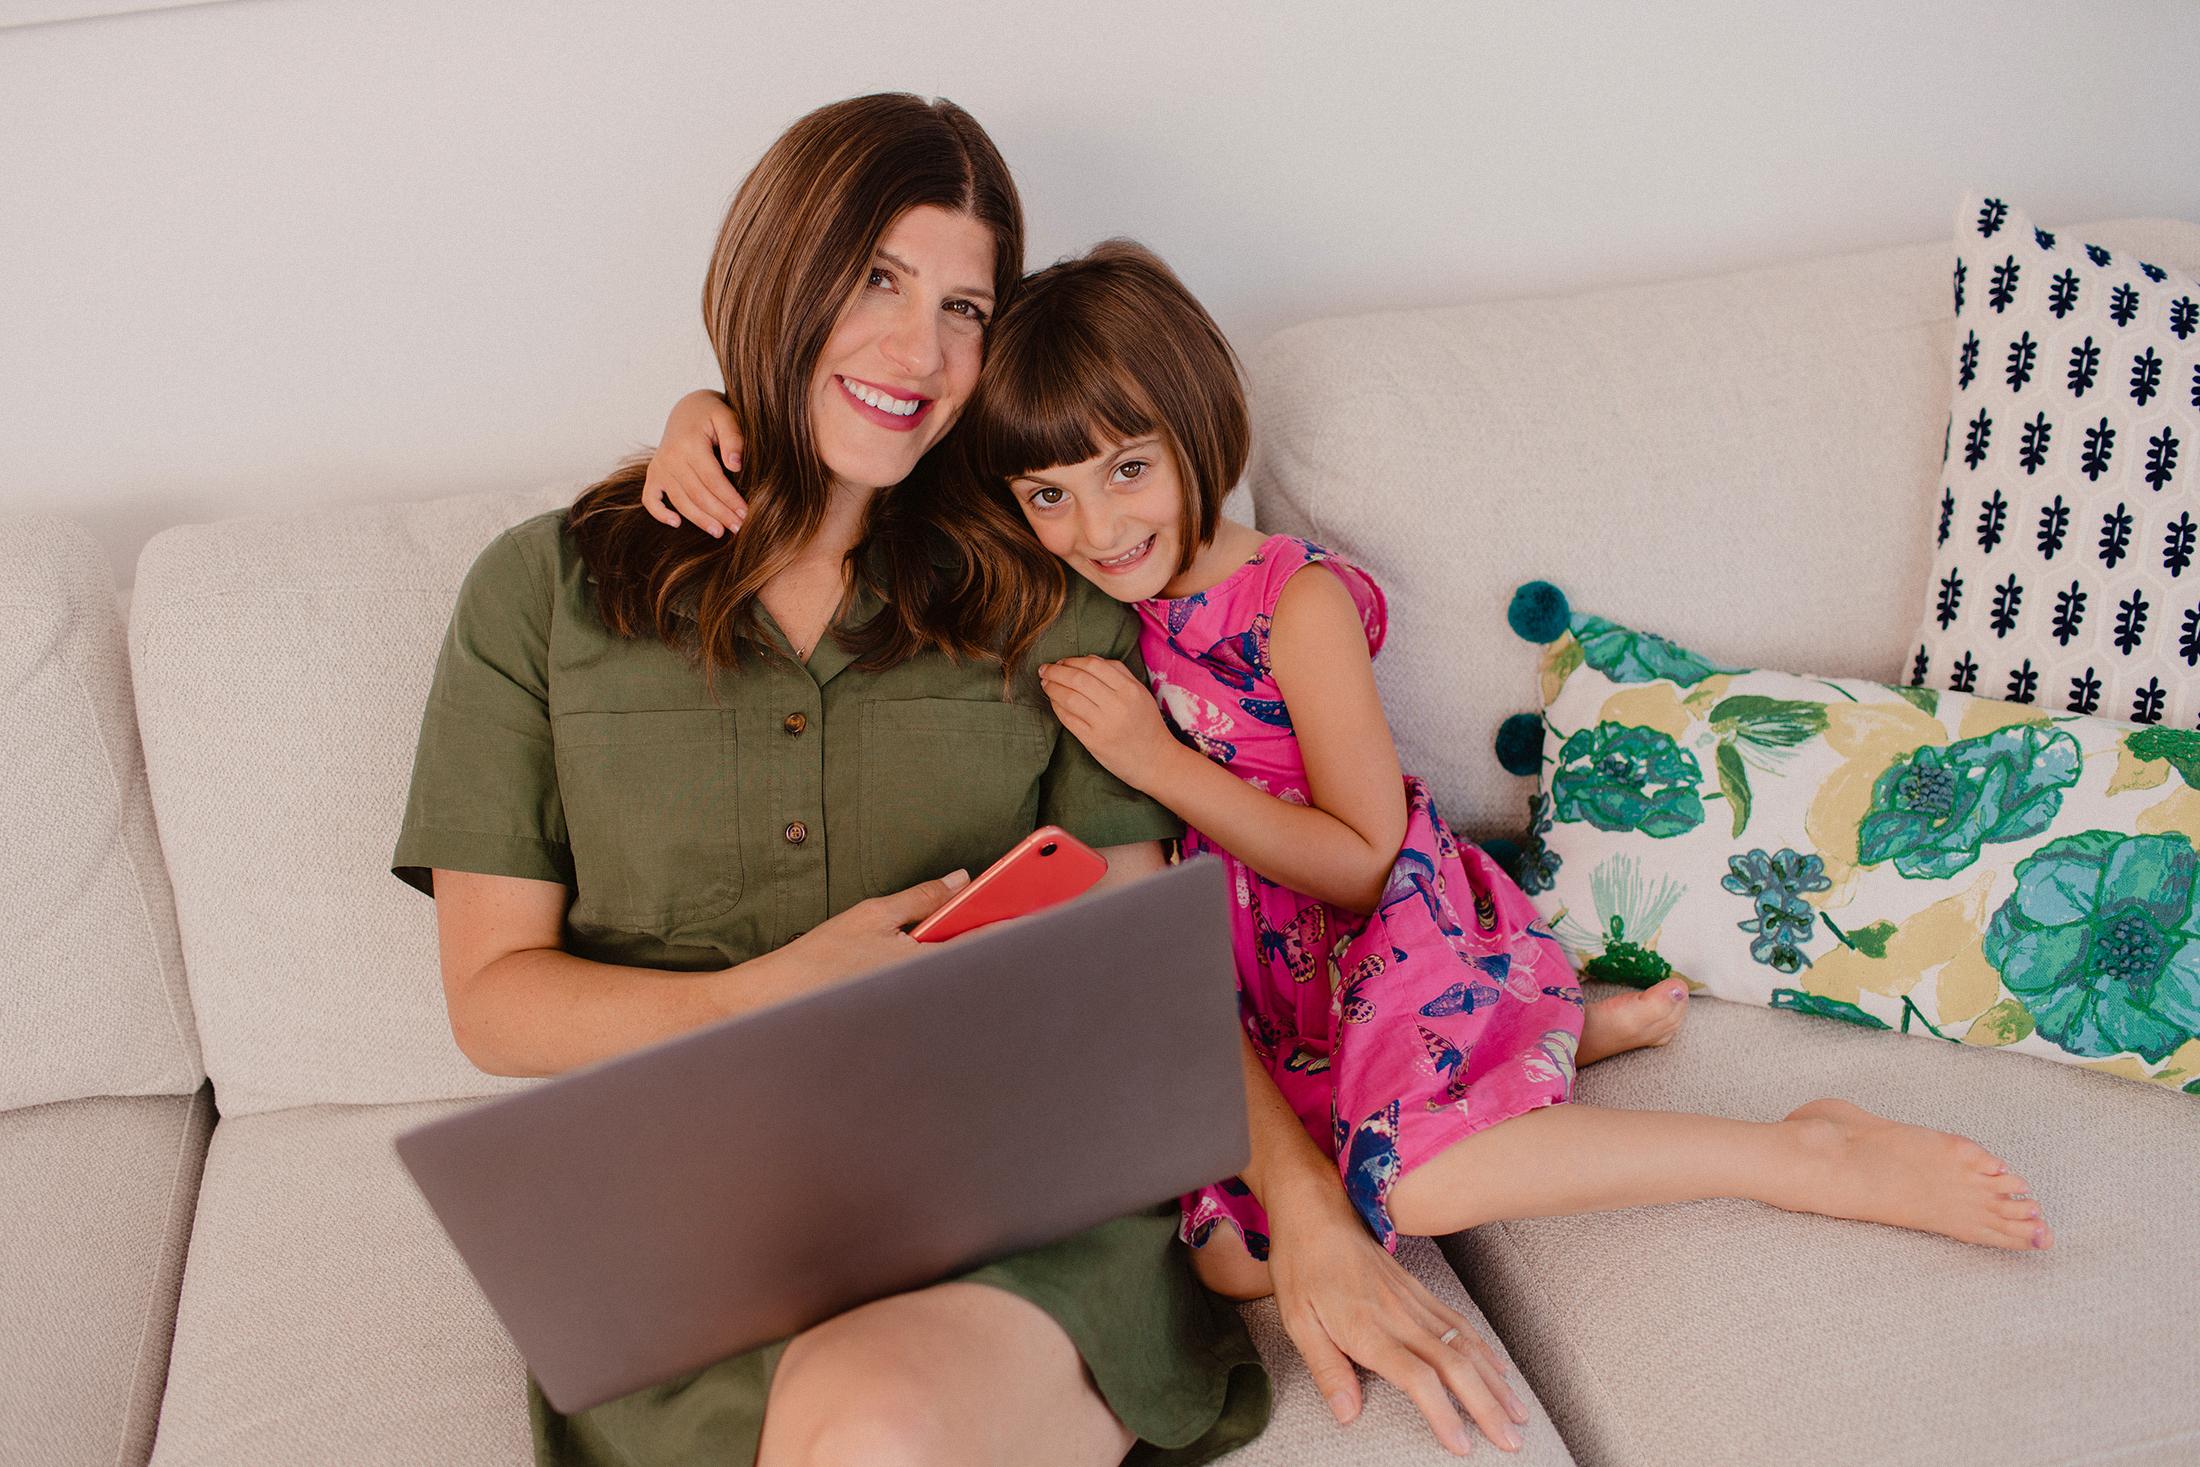 Ilana Wiles & daughter Harlow